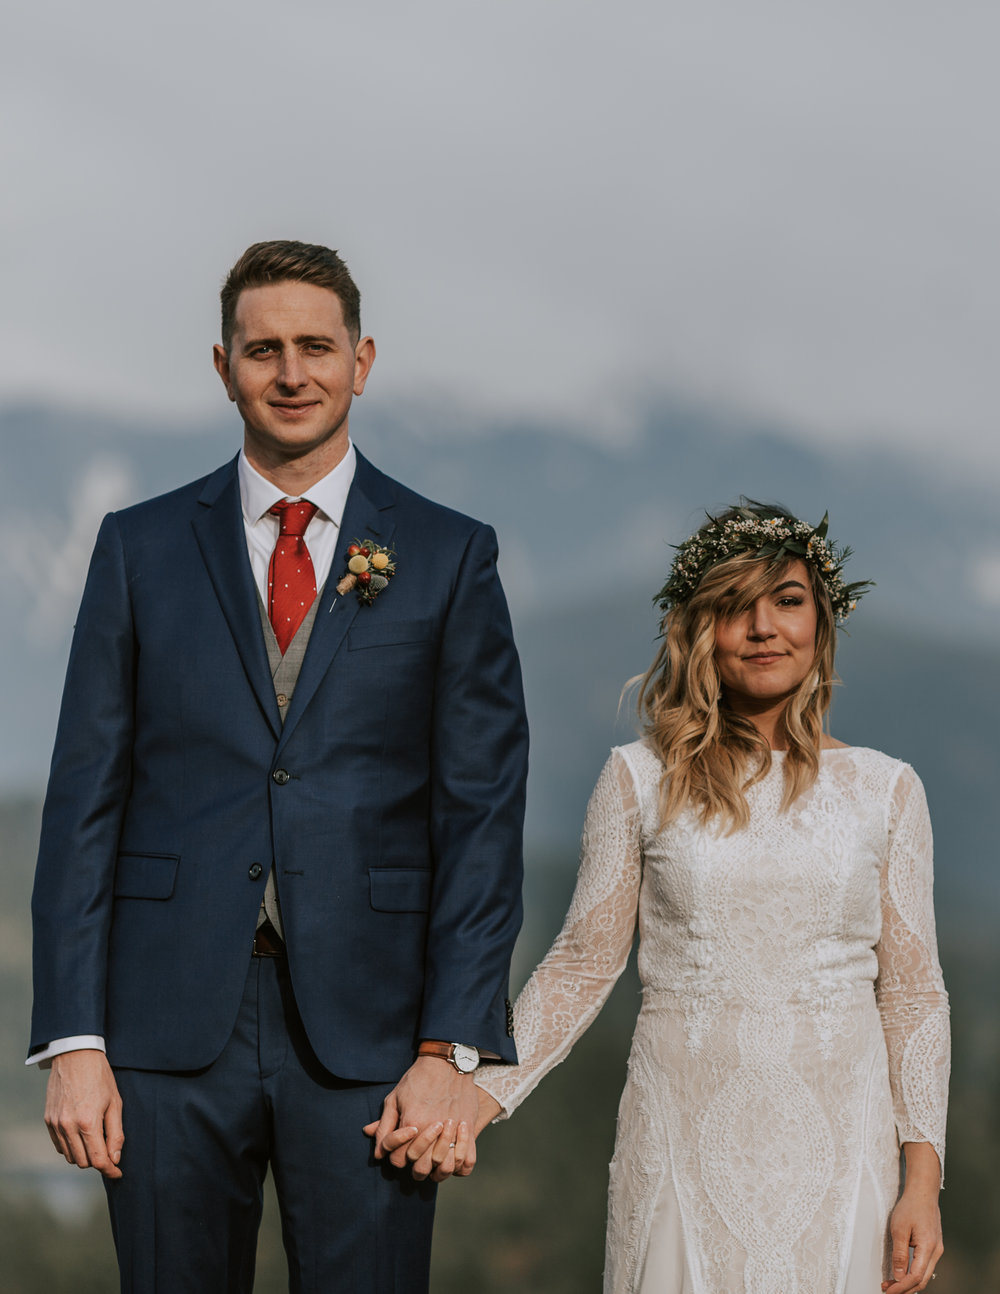 Sunshine Coast Wedding Photos - Mountain Wedding Photos - Sunshine Coast Wedding Photographer - Vancouver Wedding Photographer - Jennifer Picard355-1.JPG